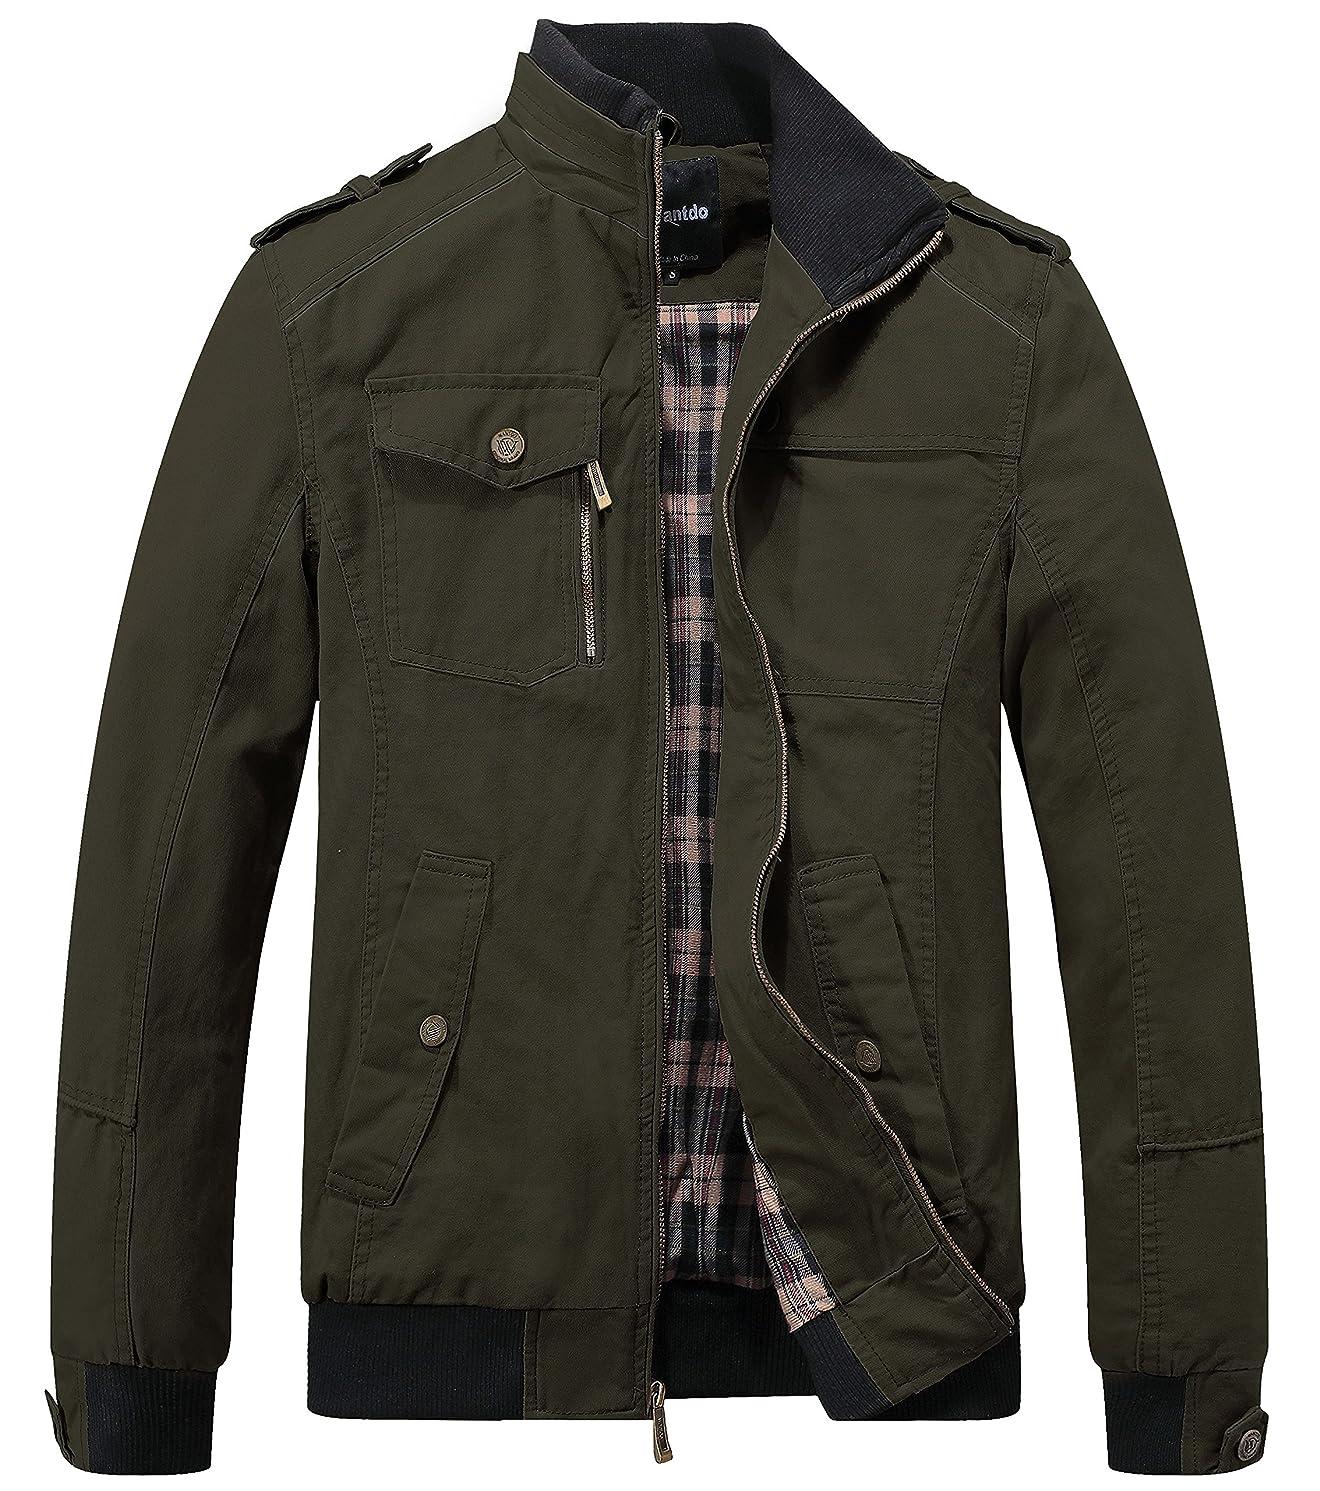 Wantdo Men's Cotton Stand Collar Windbreaker Jacket